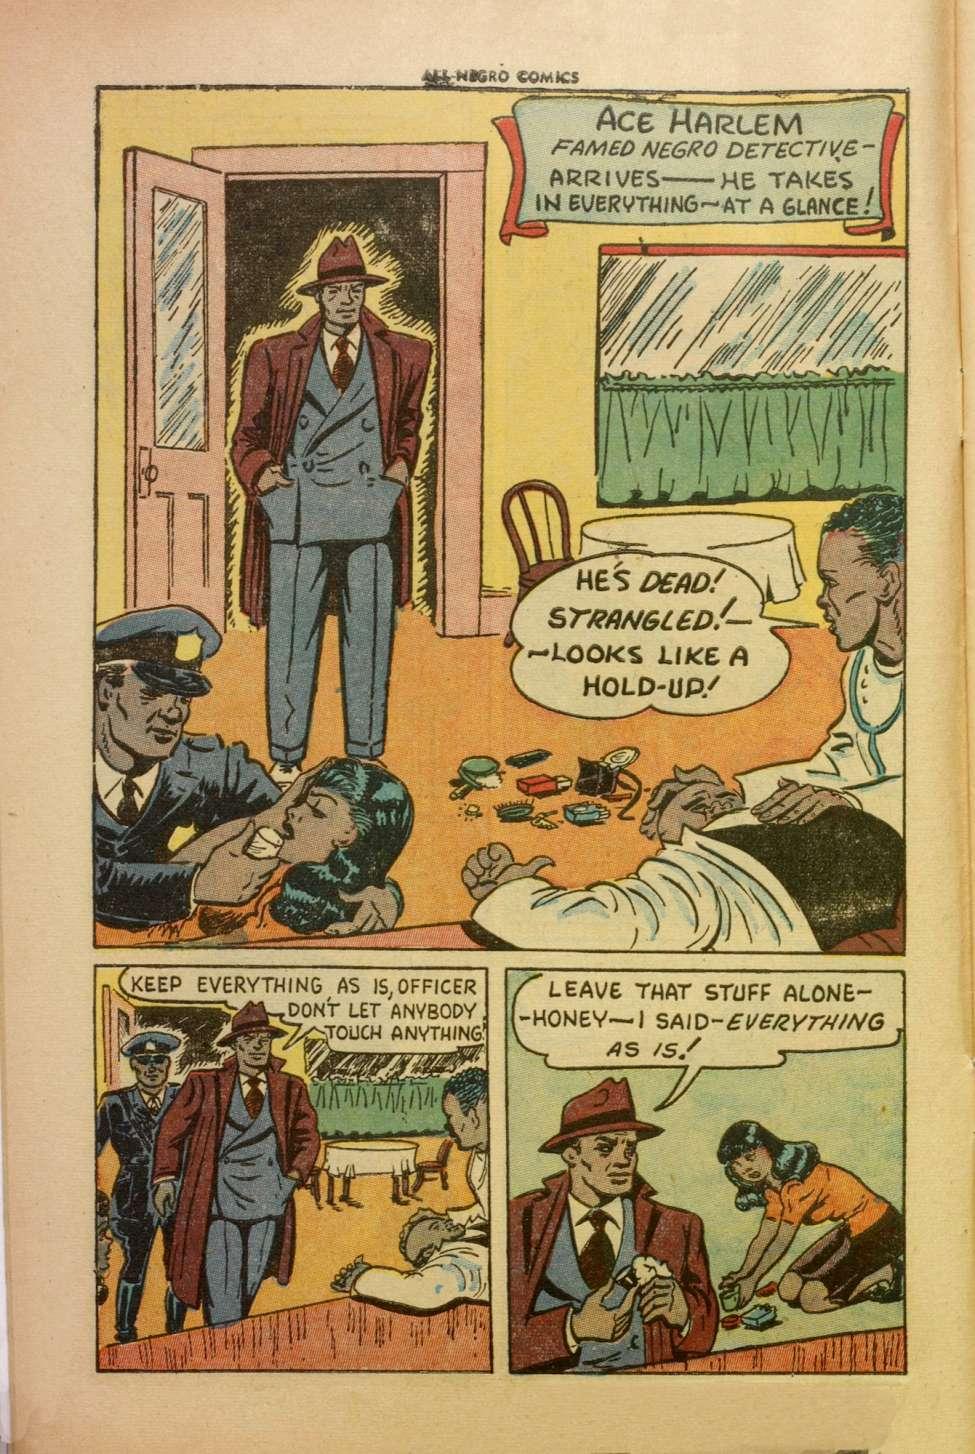 Comic Book Cover For All-Negro Comics #1